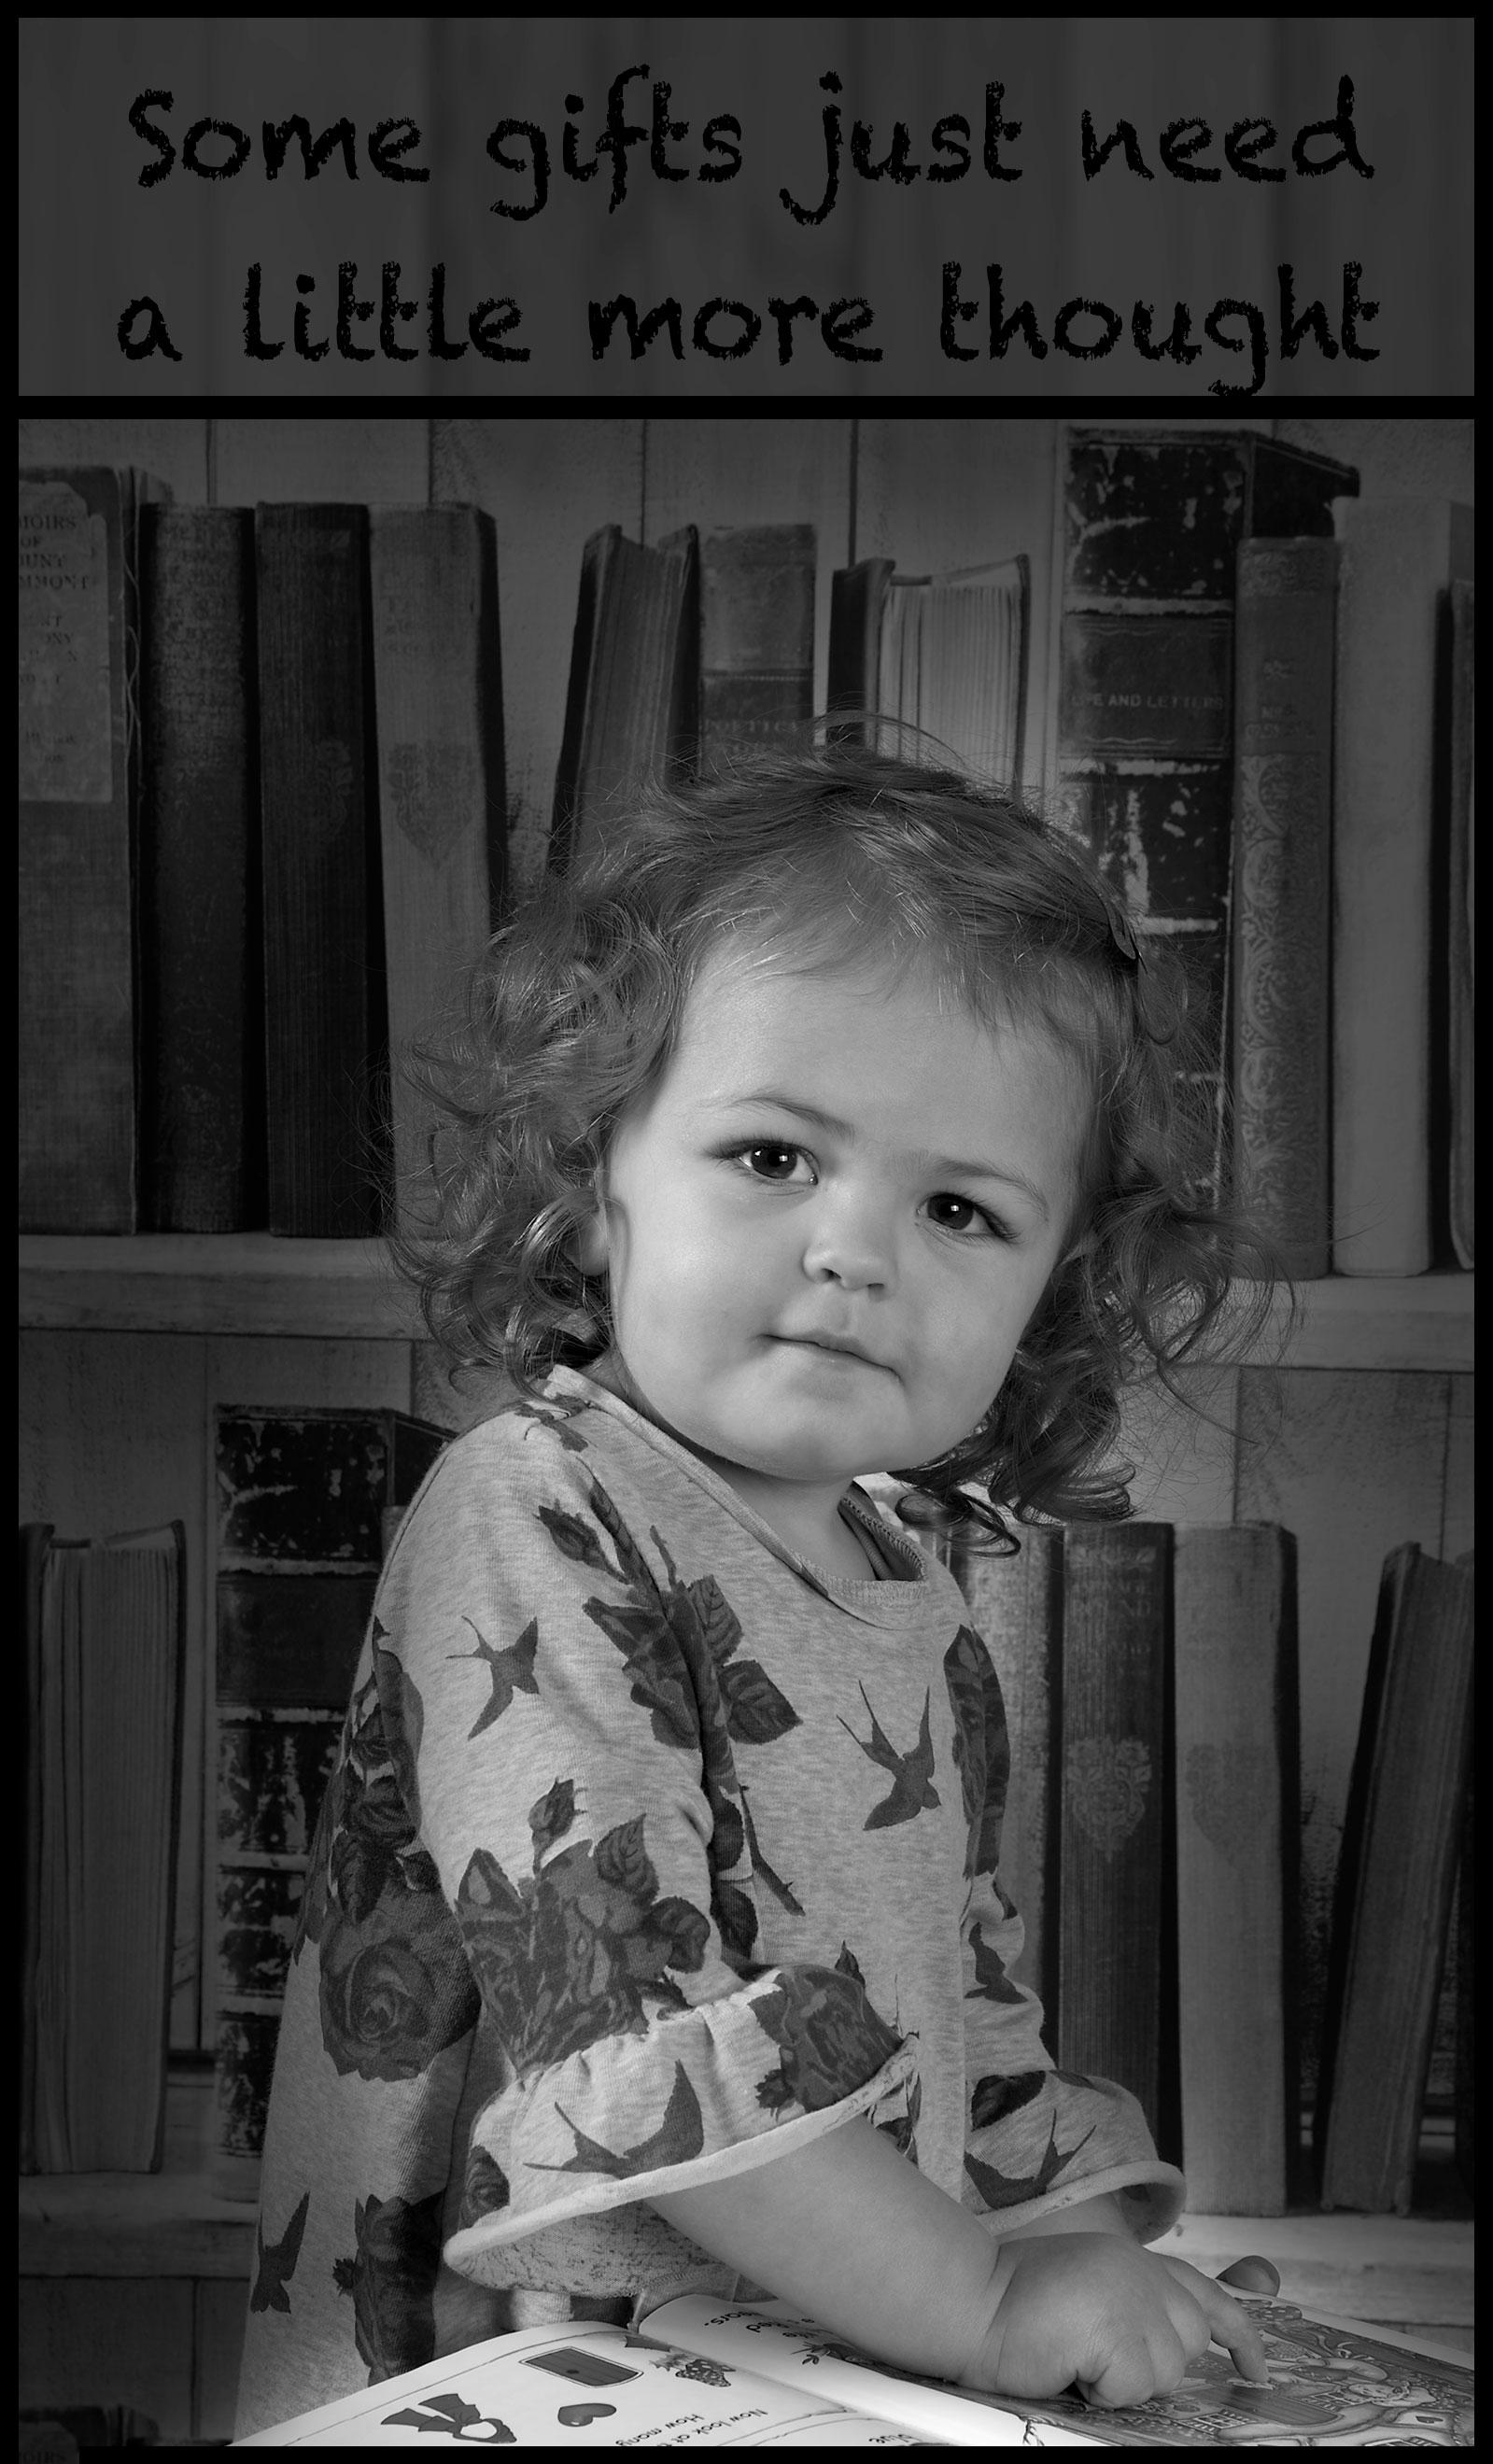 bookshelf-thought.jpg